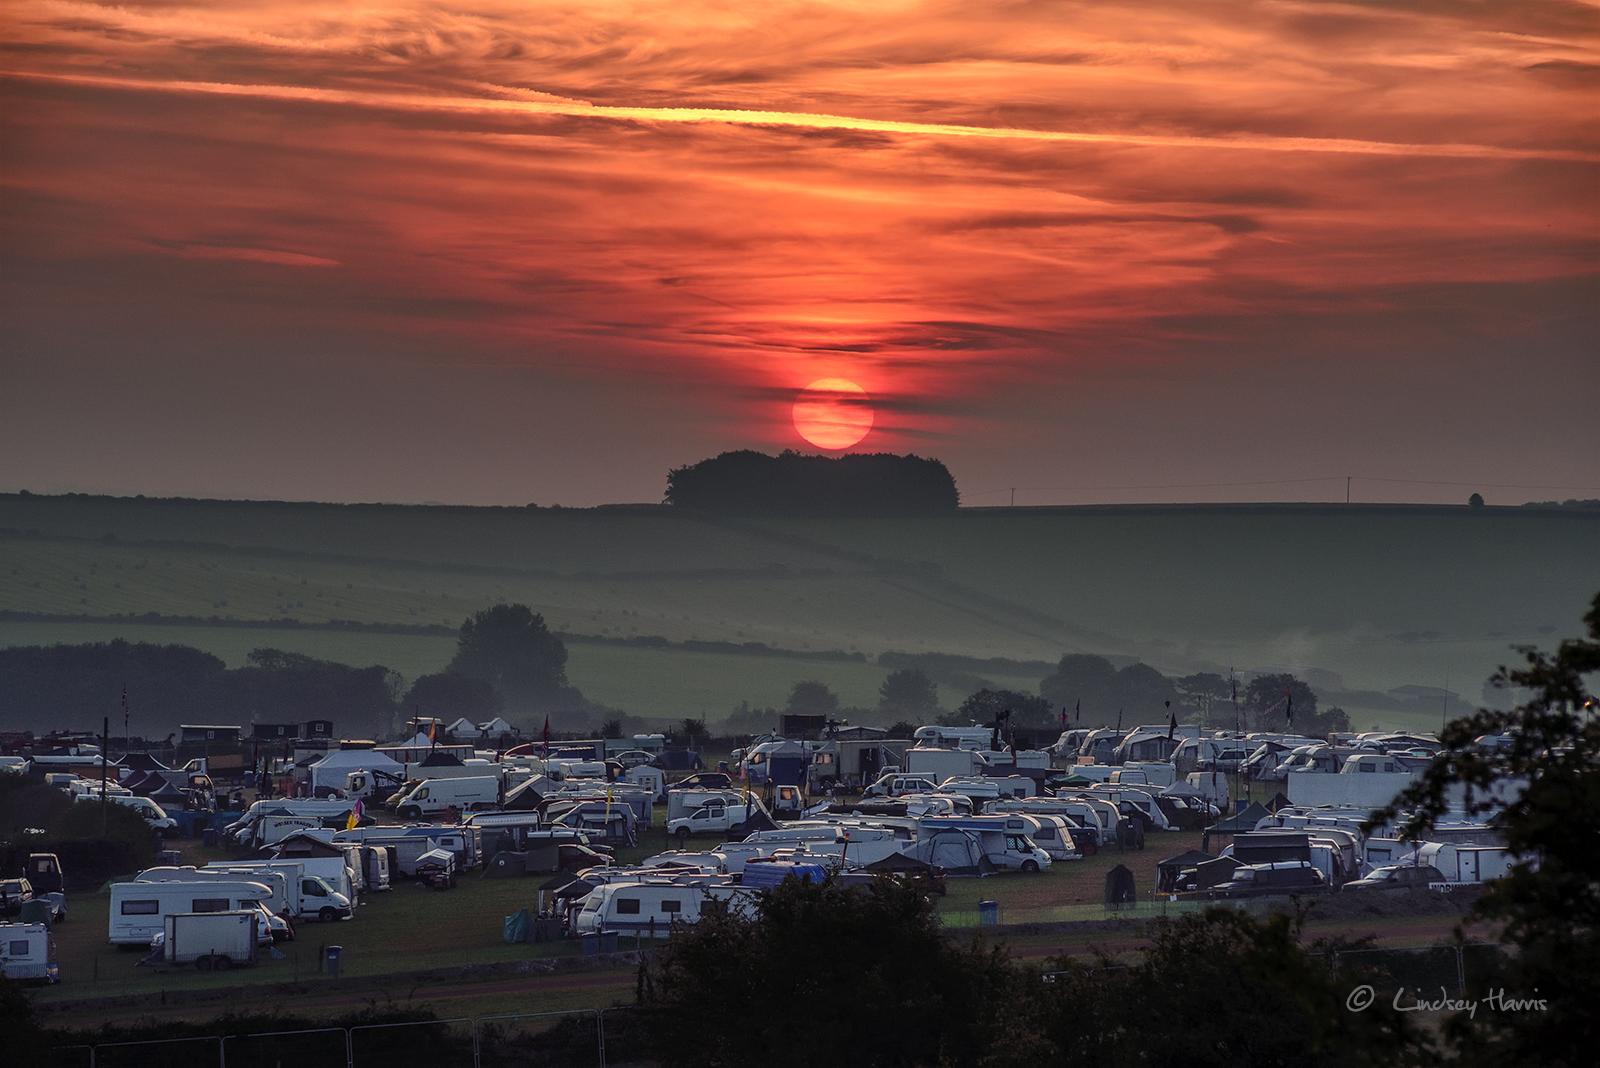 Sunrise over the Great Dorset Steam Fair 2017 - Tarrant Hinton, Dorset.